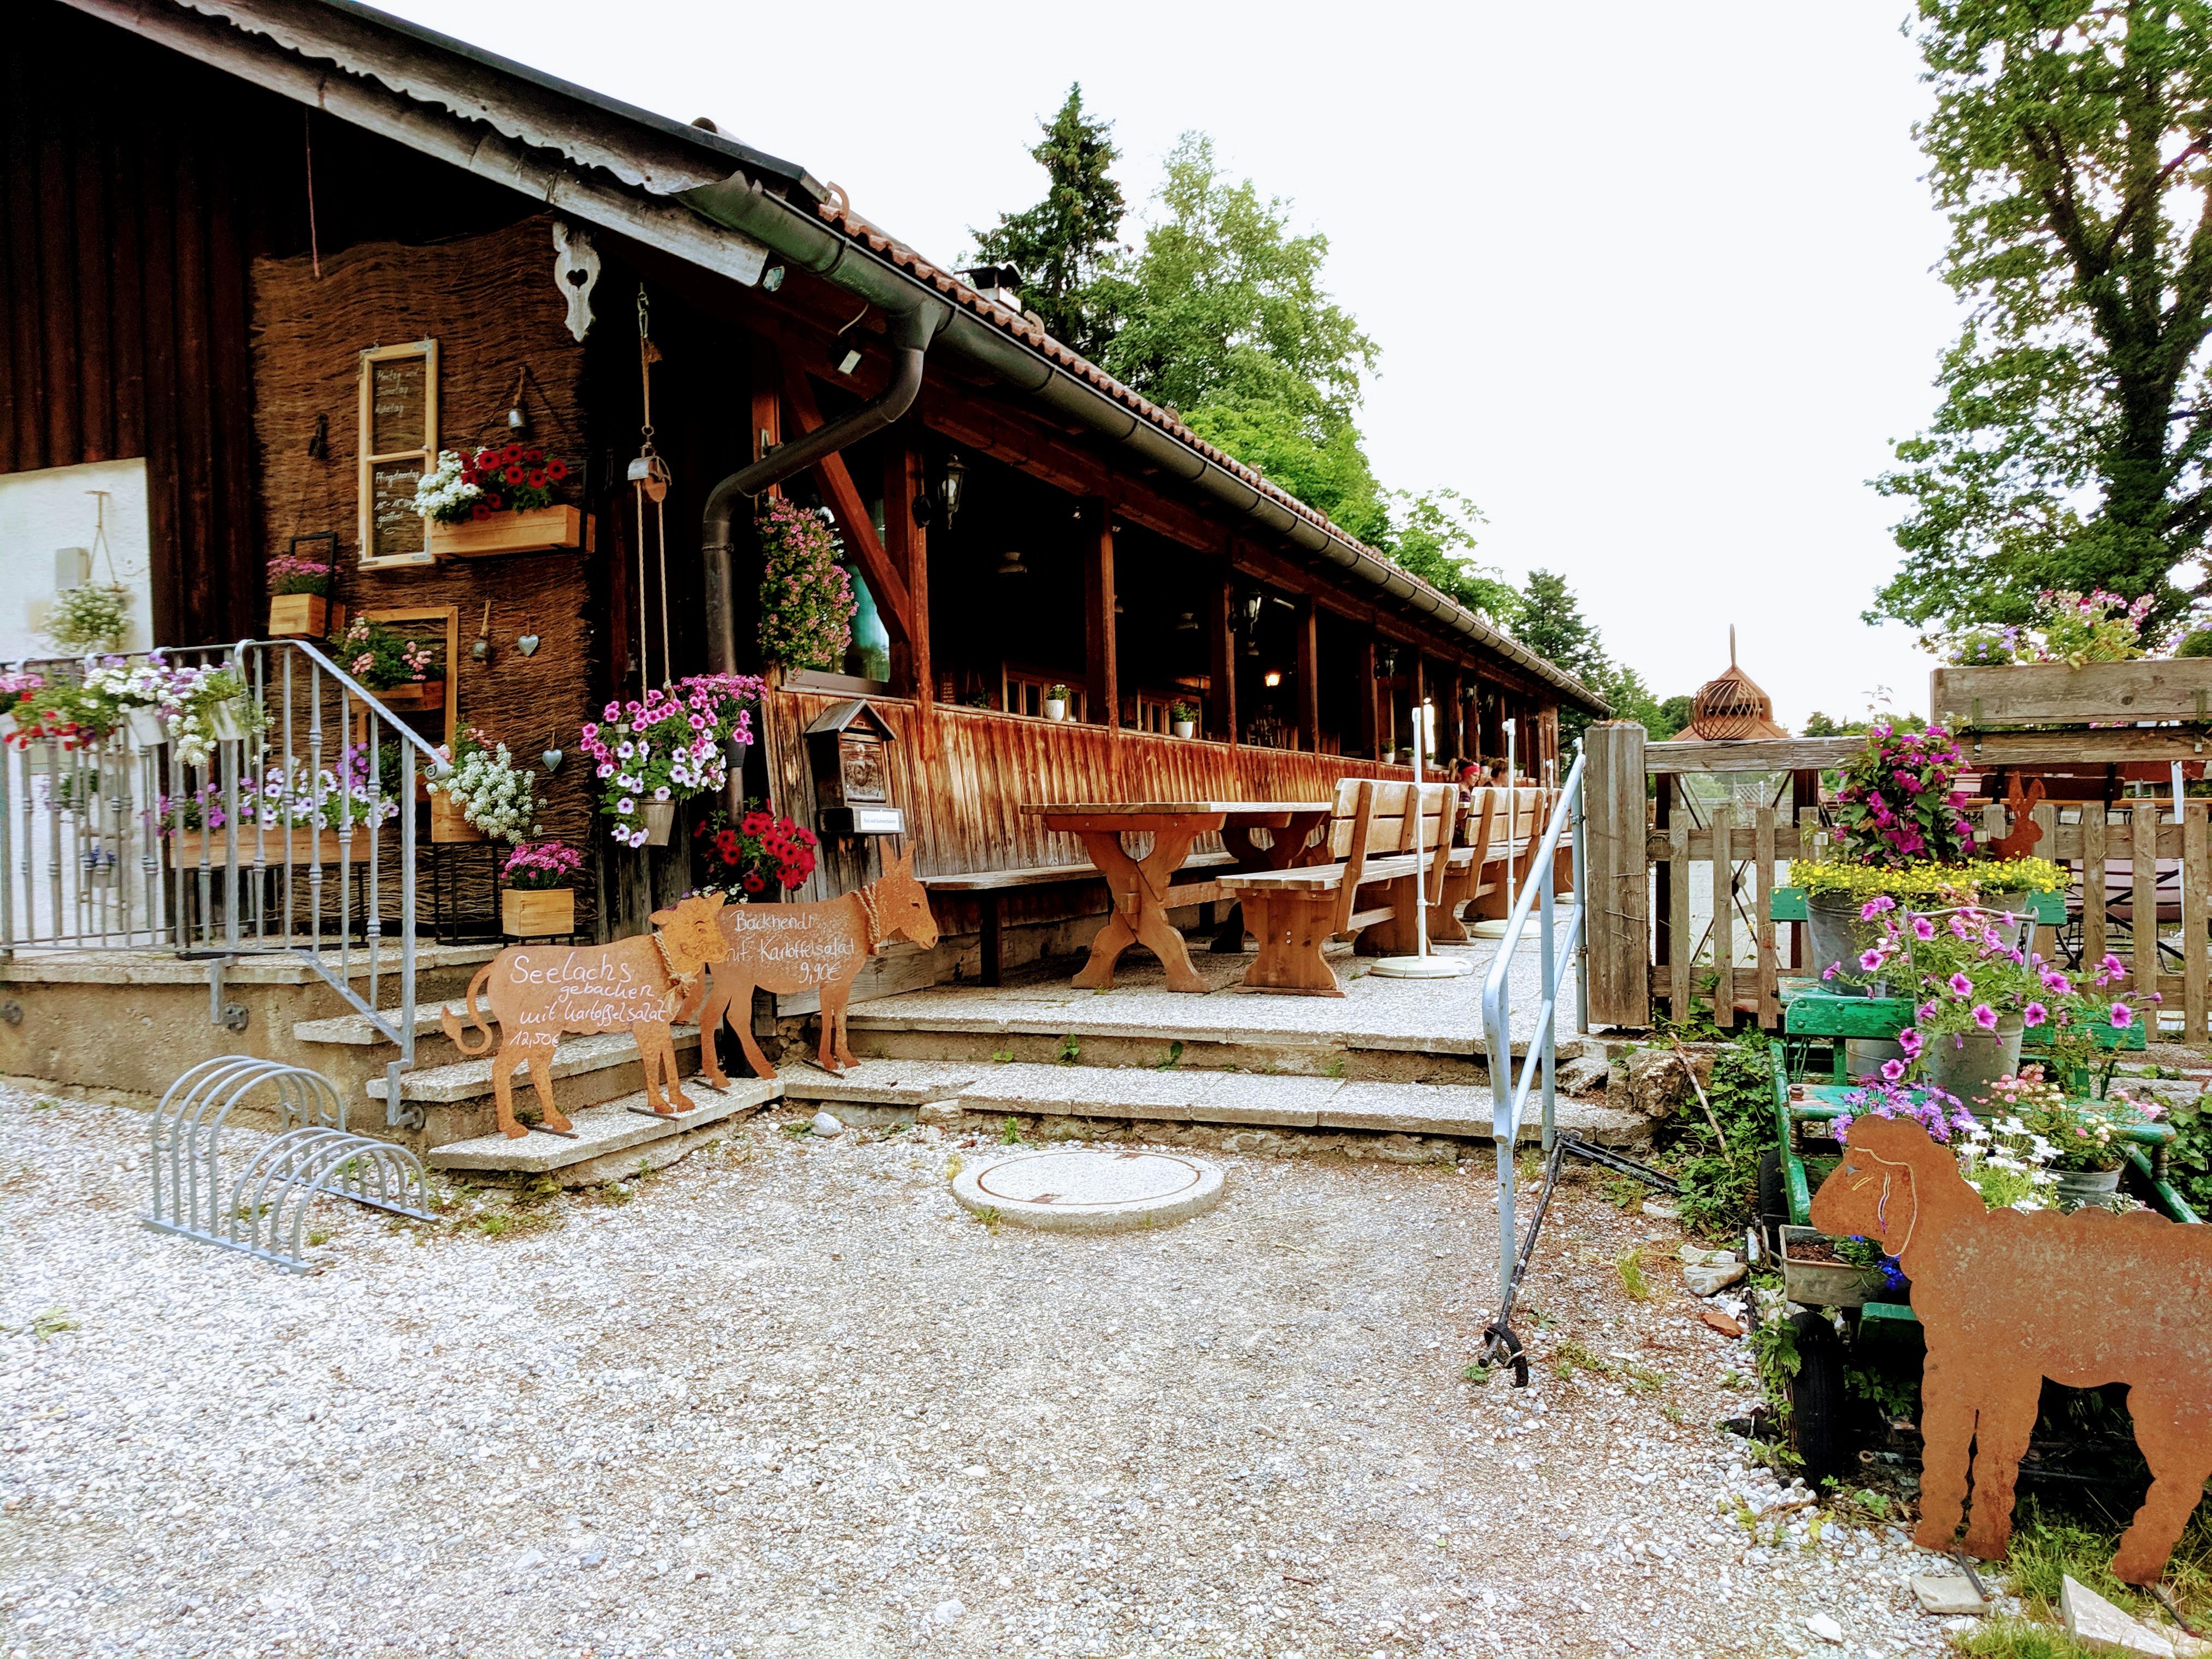 Die Hütte Waldherralm in Wackersberg bei Bad Tölz.